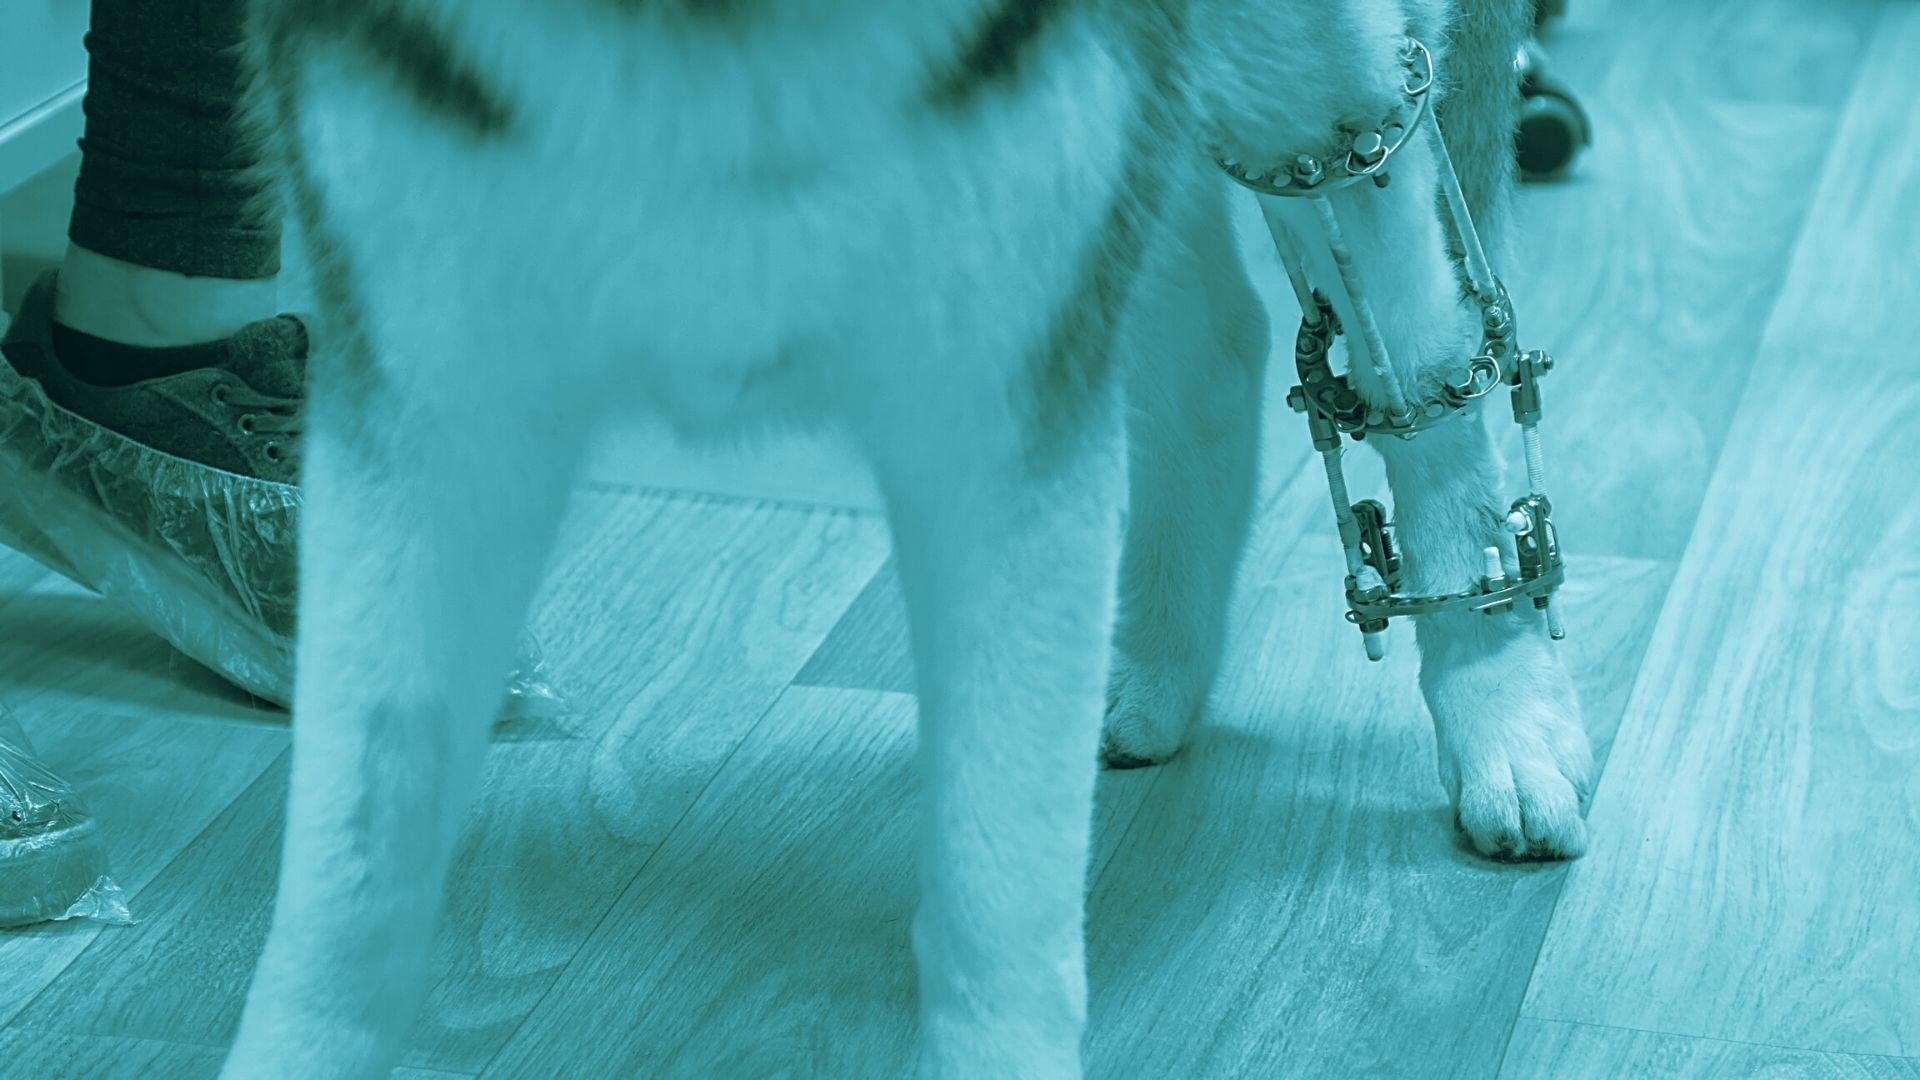 ortopedia e traumatologia veterinaria